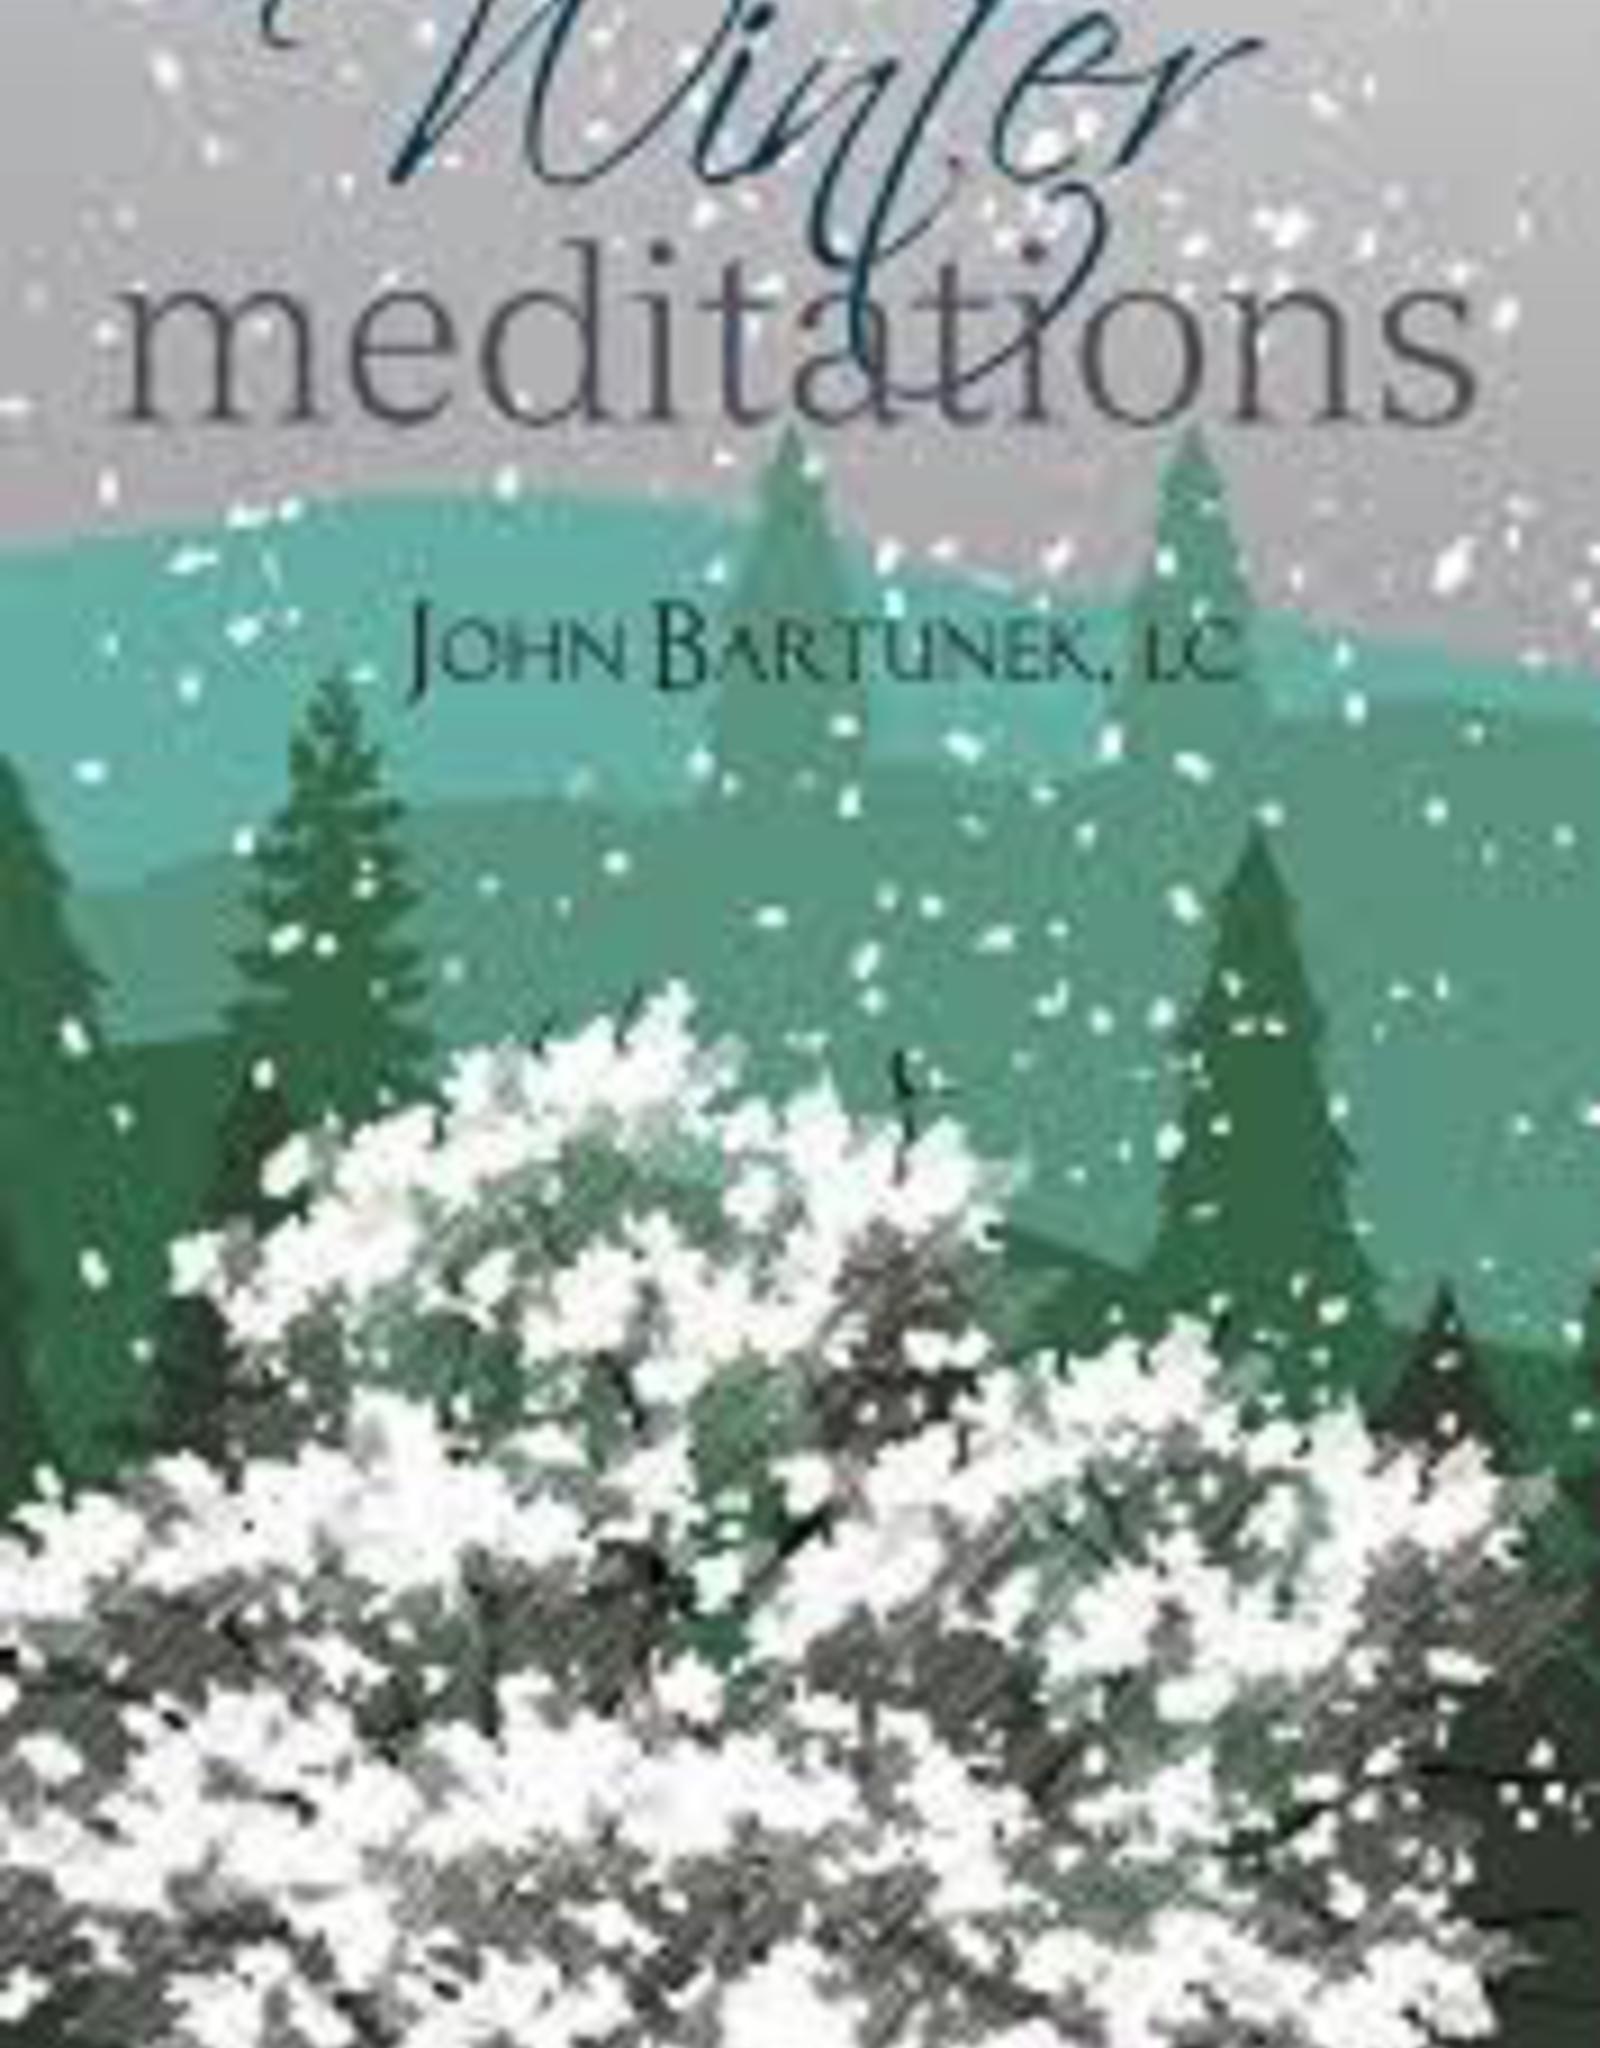 Liguori Press Winter Meditations, by Fr. John Bartunek (paperback)